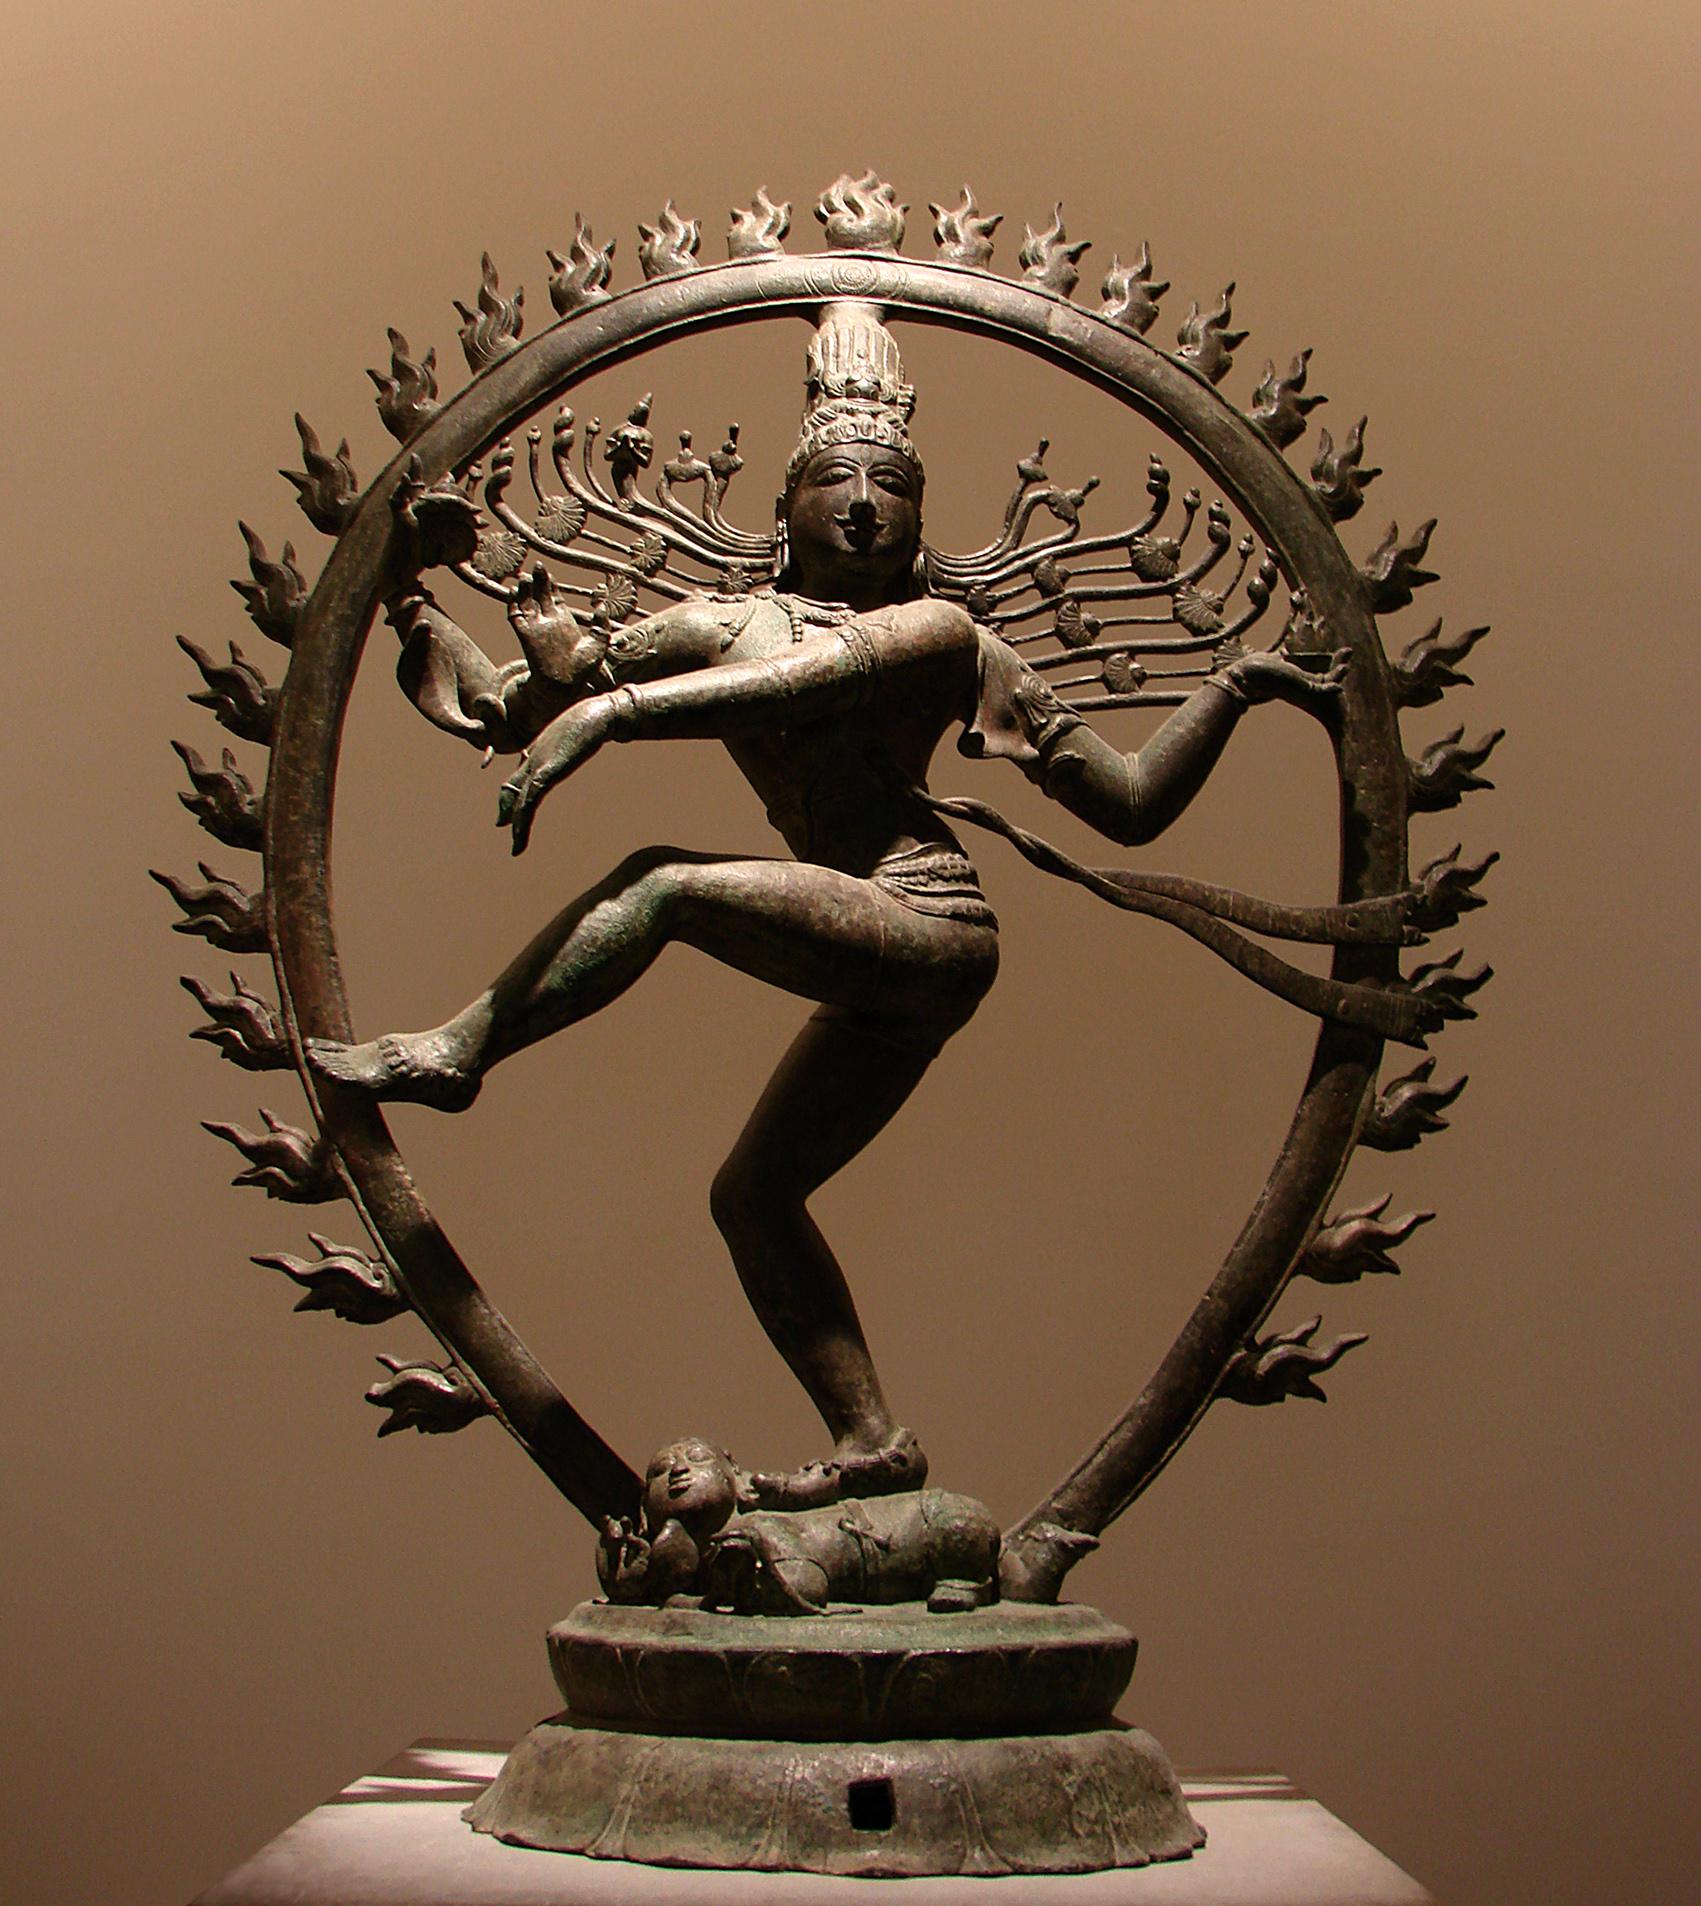 Depiction of Arte de la India